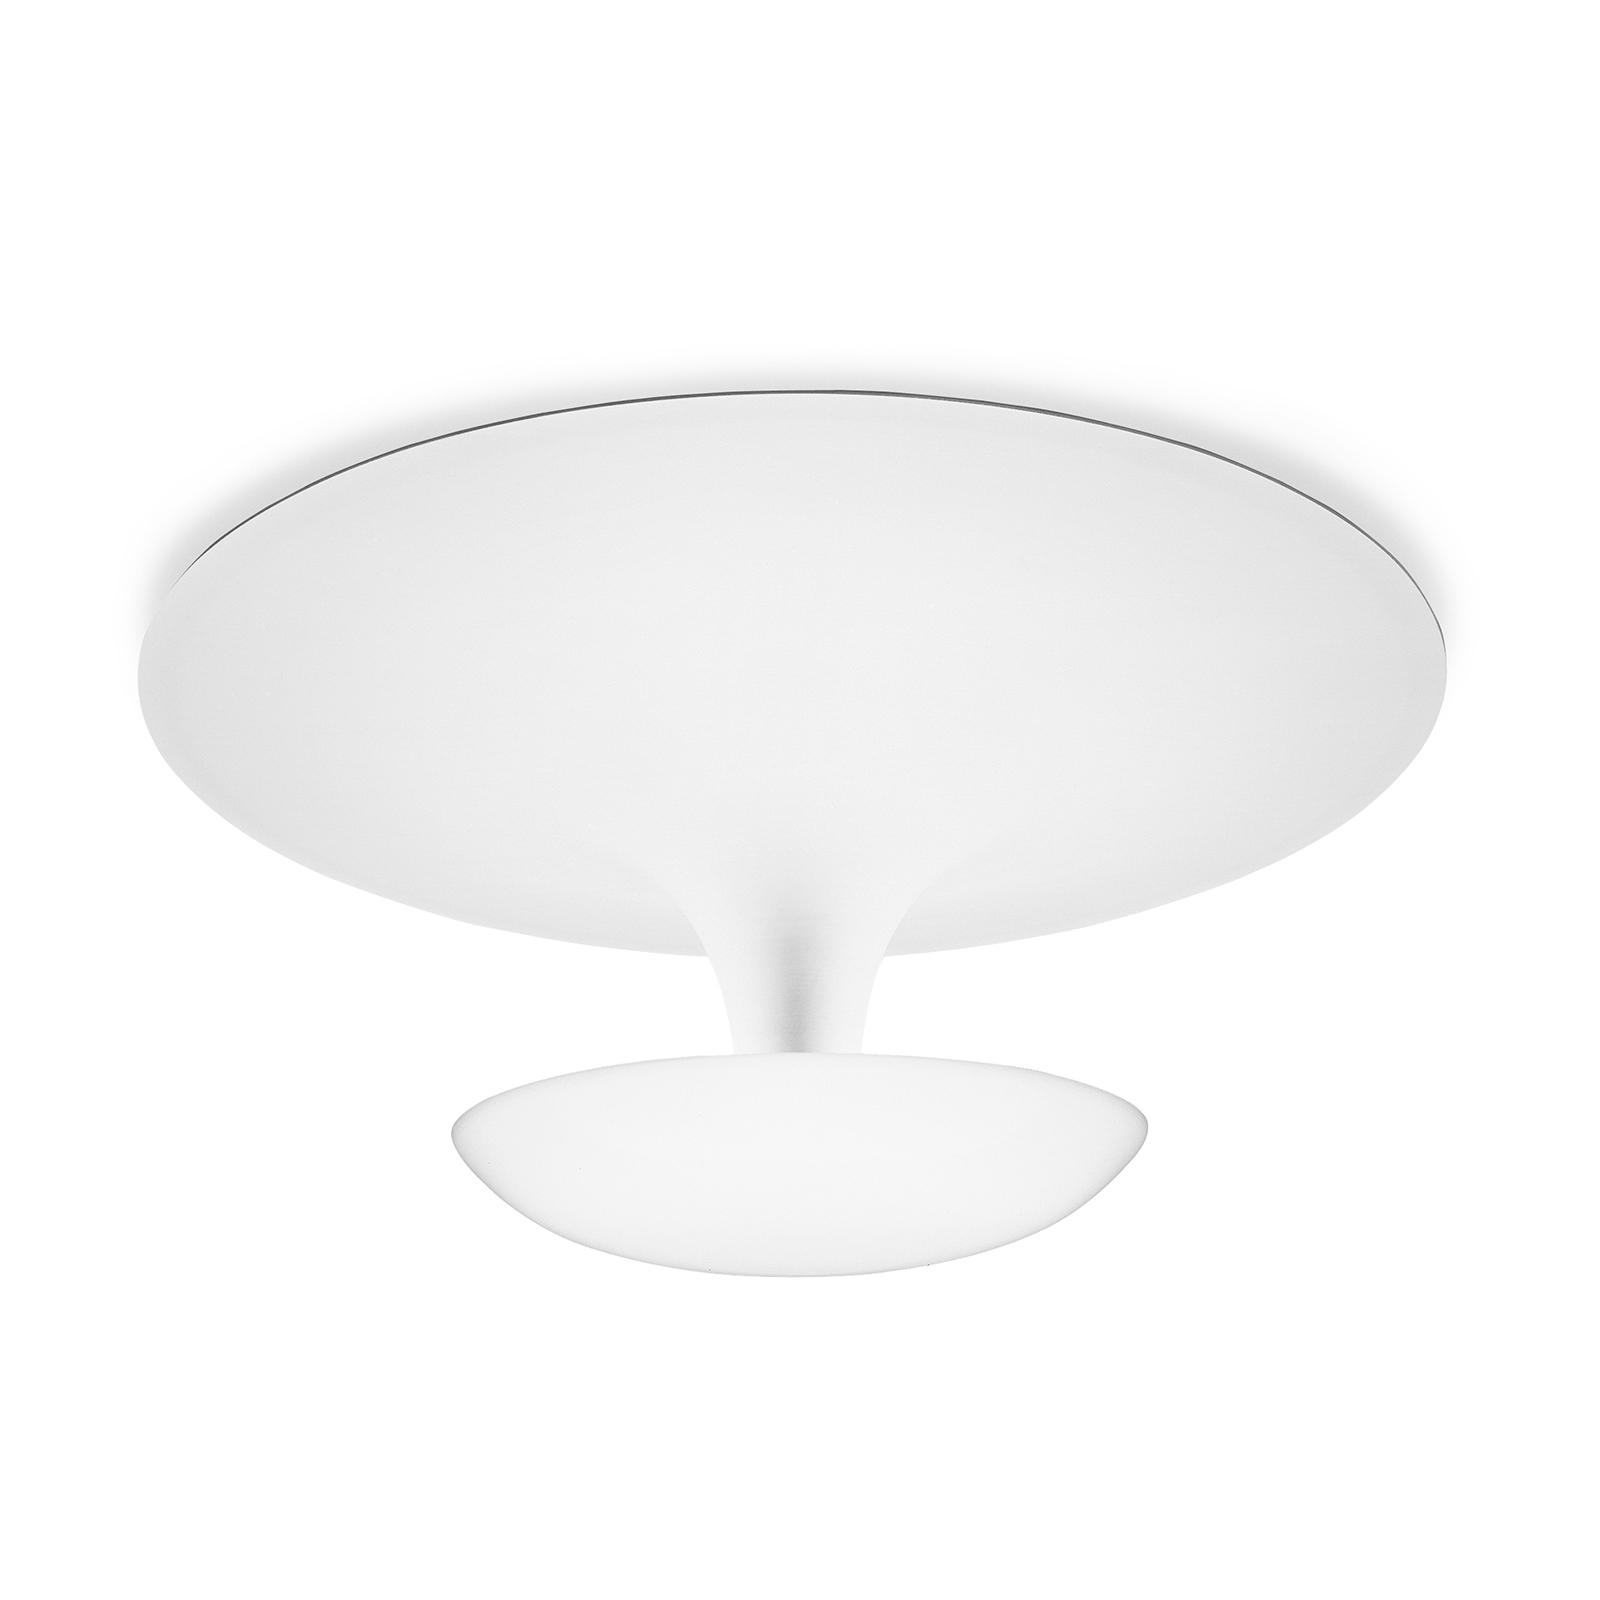 Vibia Funnel kattovalaisin 35 cm, matta valkoinen